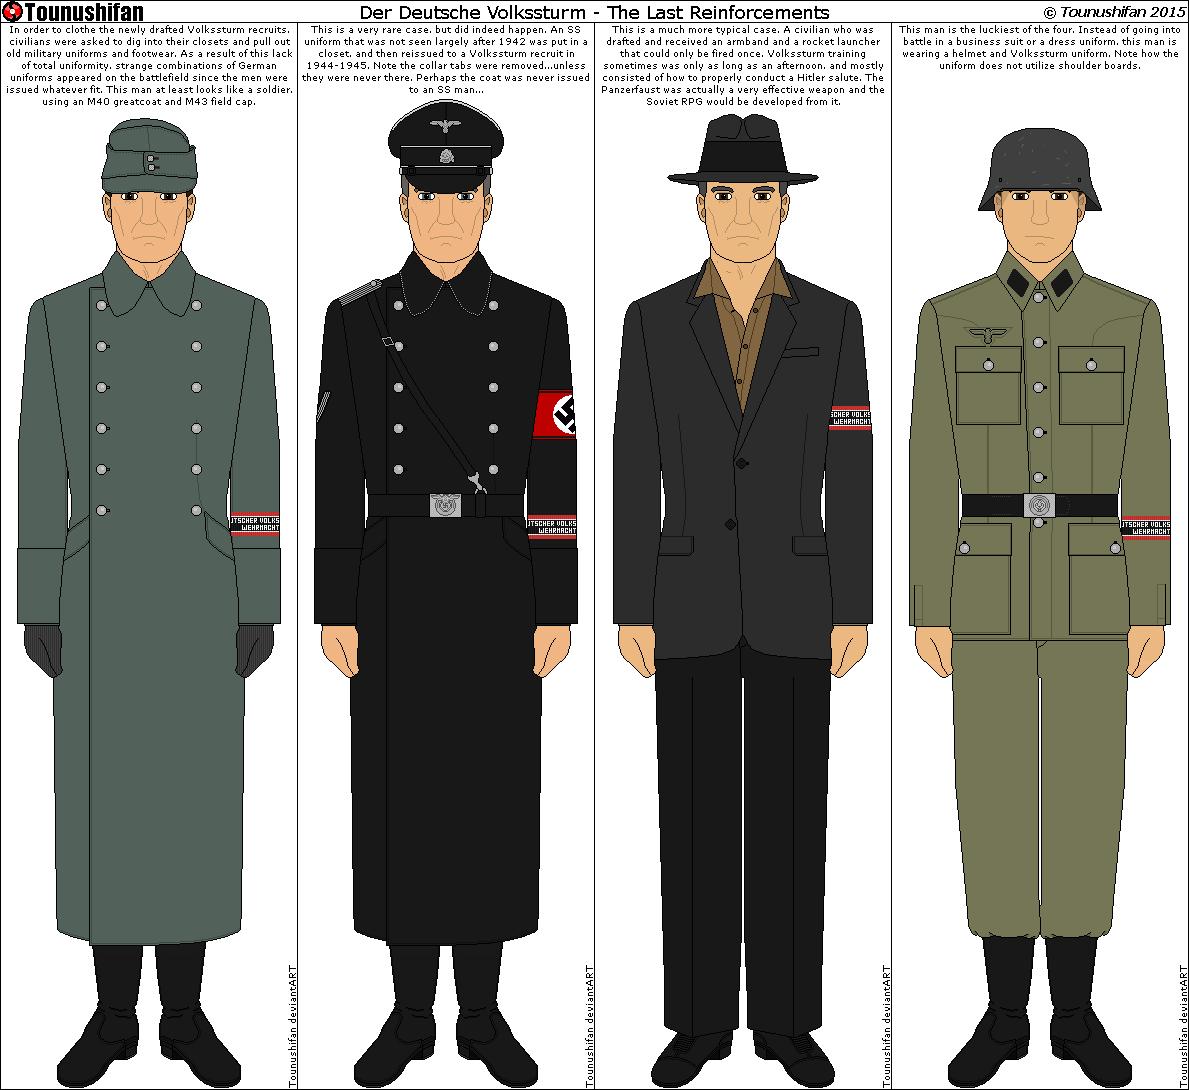 Some Volkssturm Recruits by Grand-Lobster-King on DeviantArt